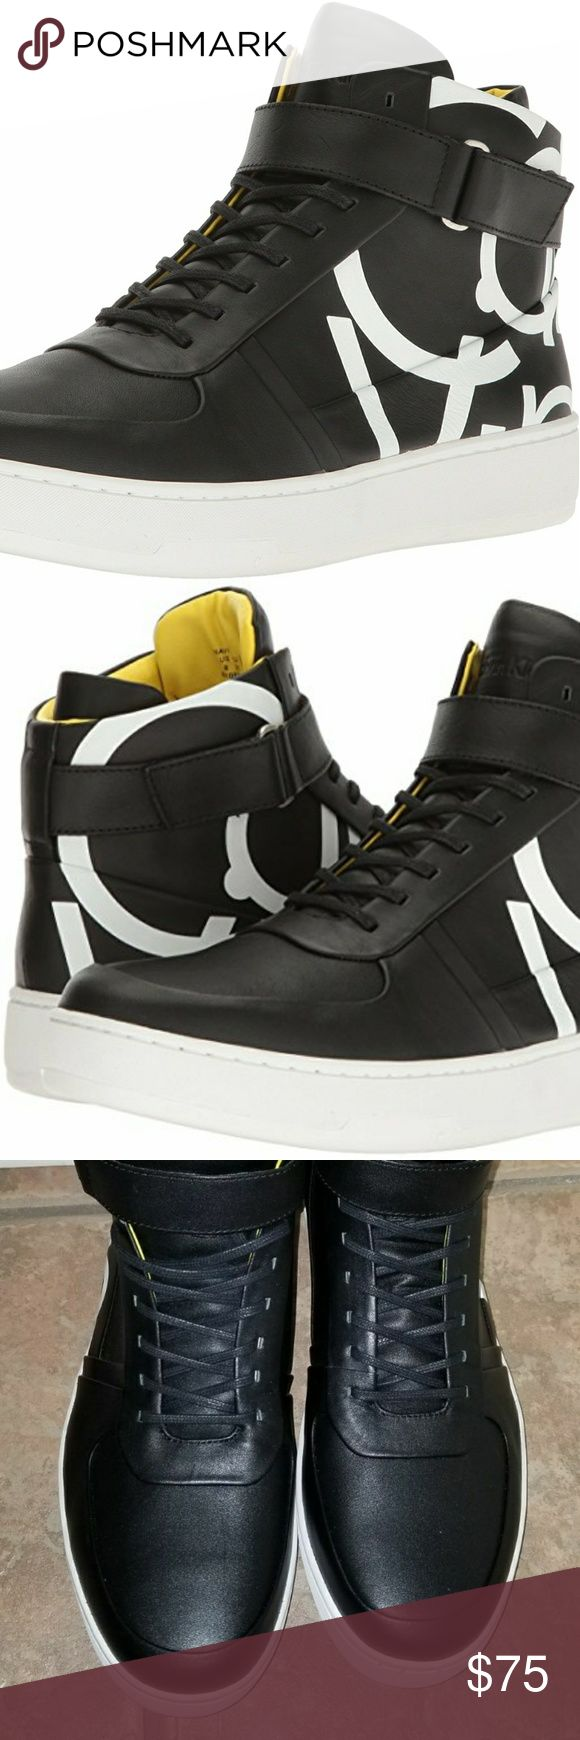 Calvin Klein Men's Navin Napa Calf Leather New NIB Calvin Klein Men's Navin Napa Calf Leather Fashion Black Sneaker Size 11.5 Calvin Klein Shoes Sneakers